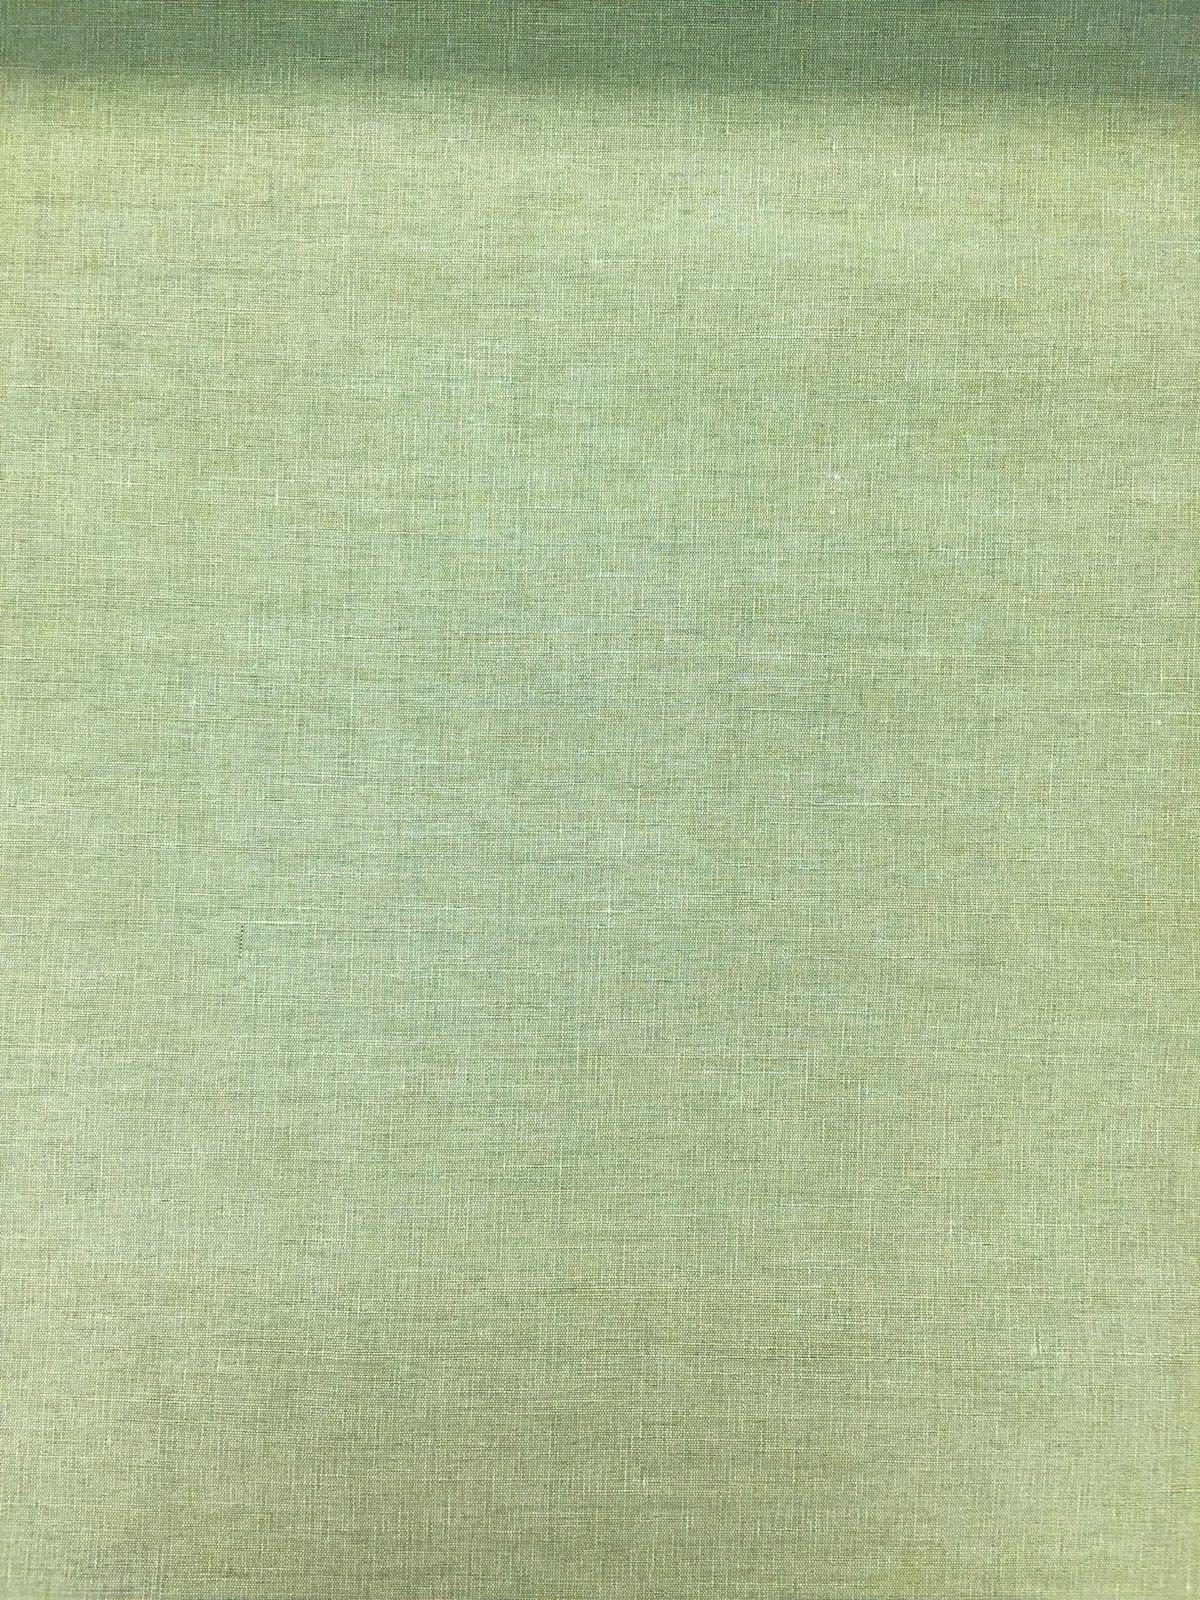 Olive Silk Linen Blend